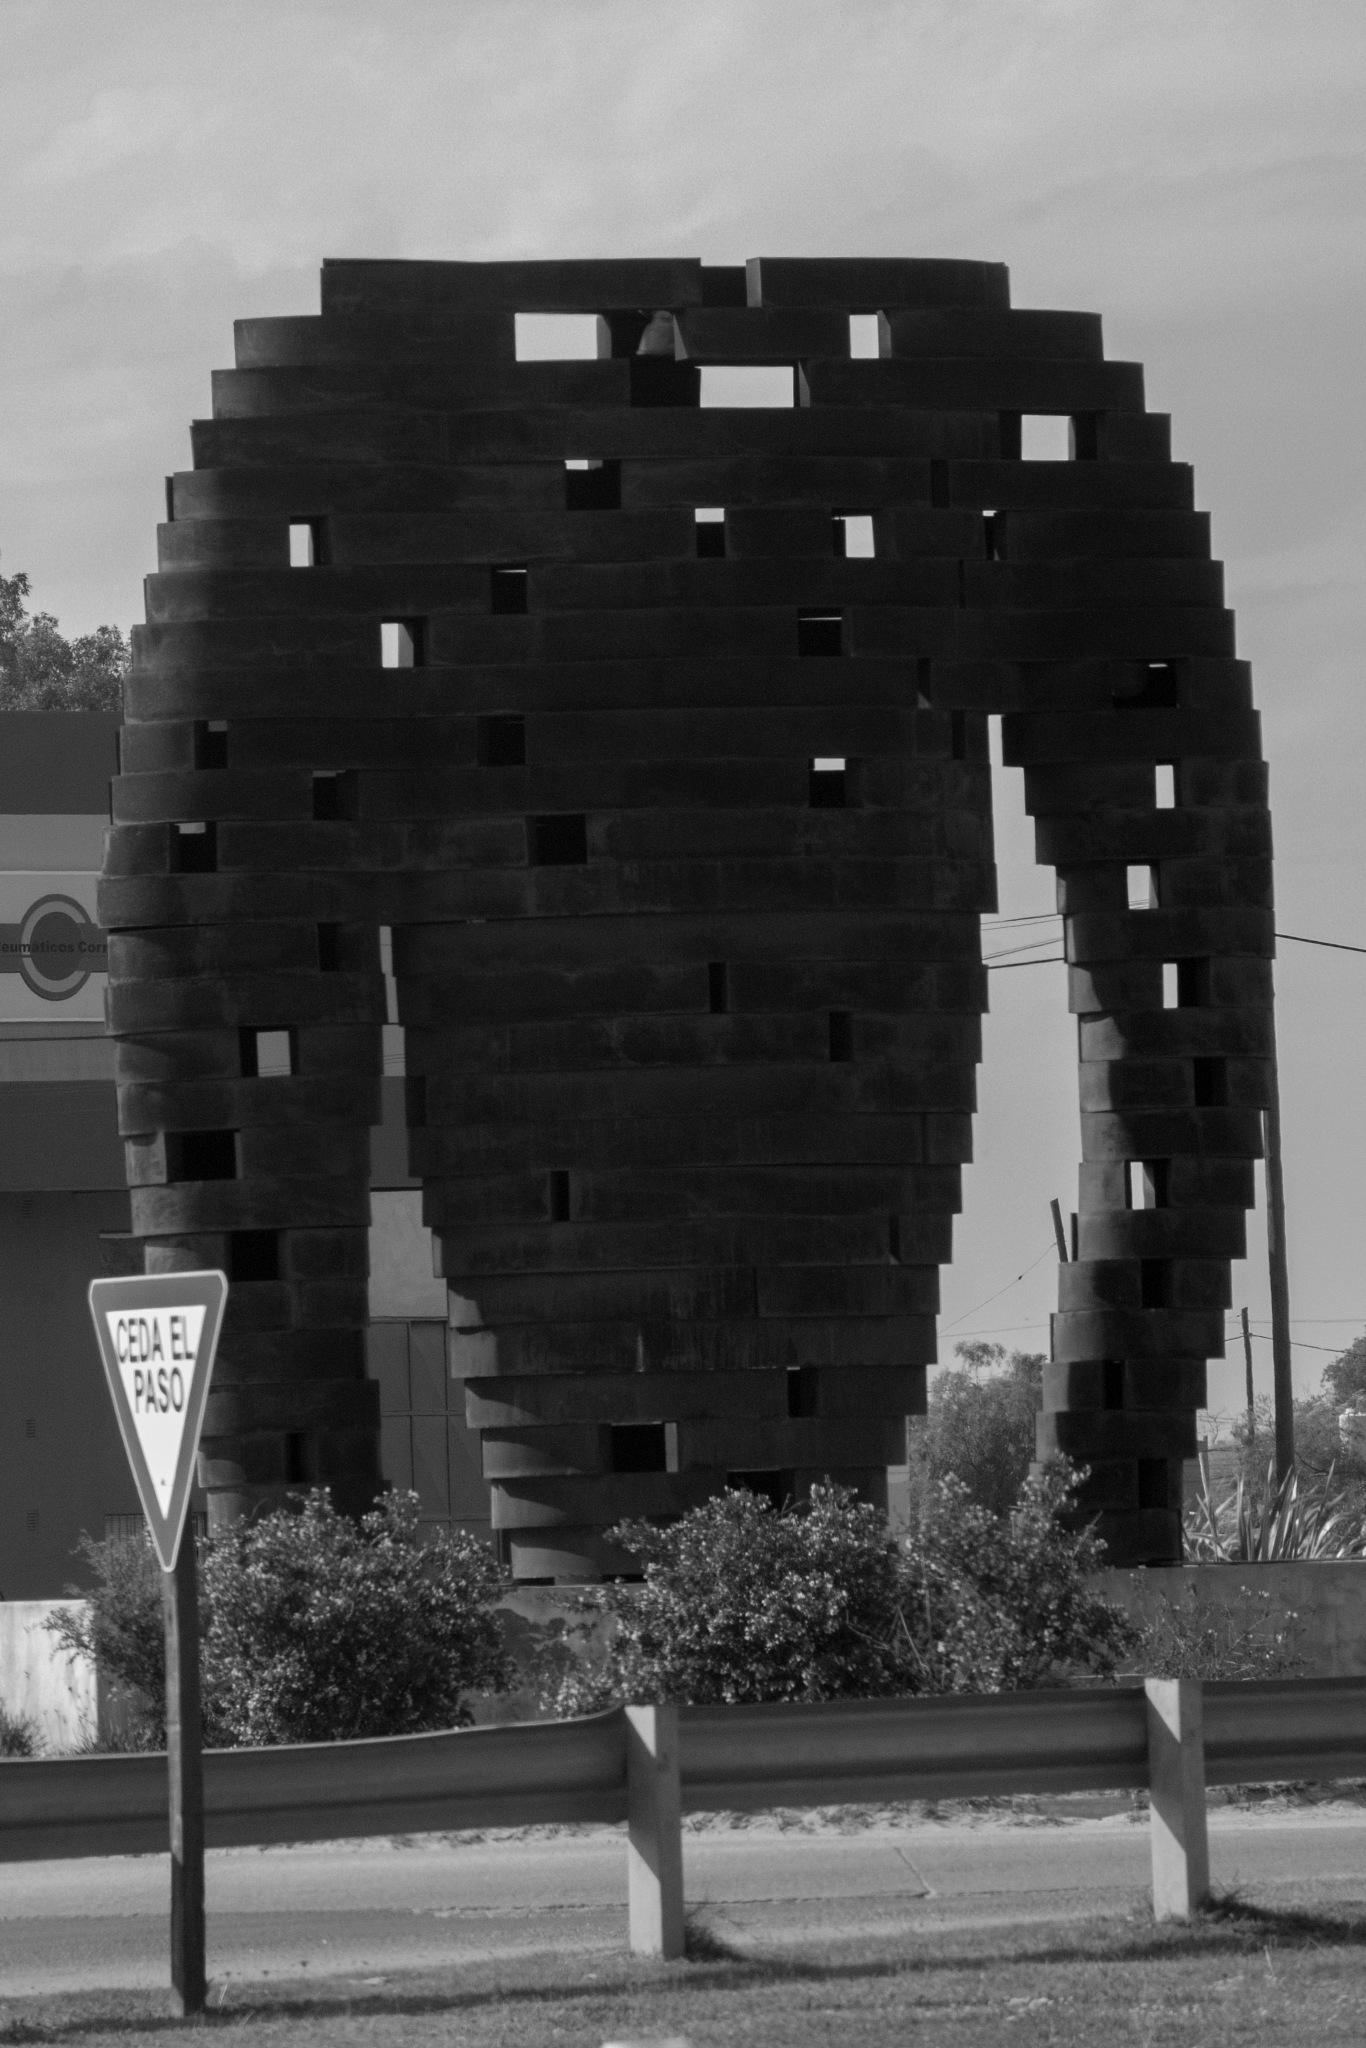 #MrRobot by Juan Pablo González